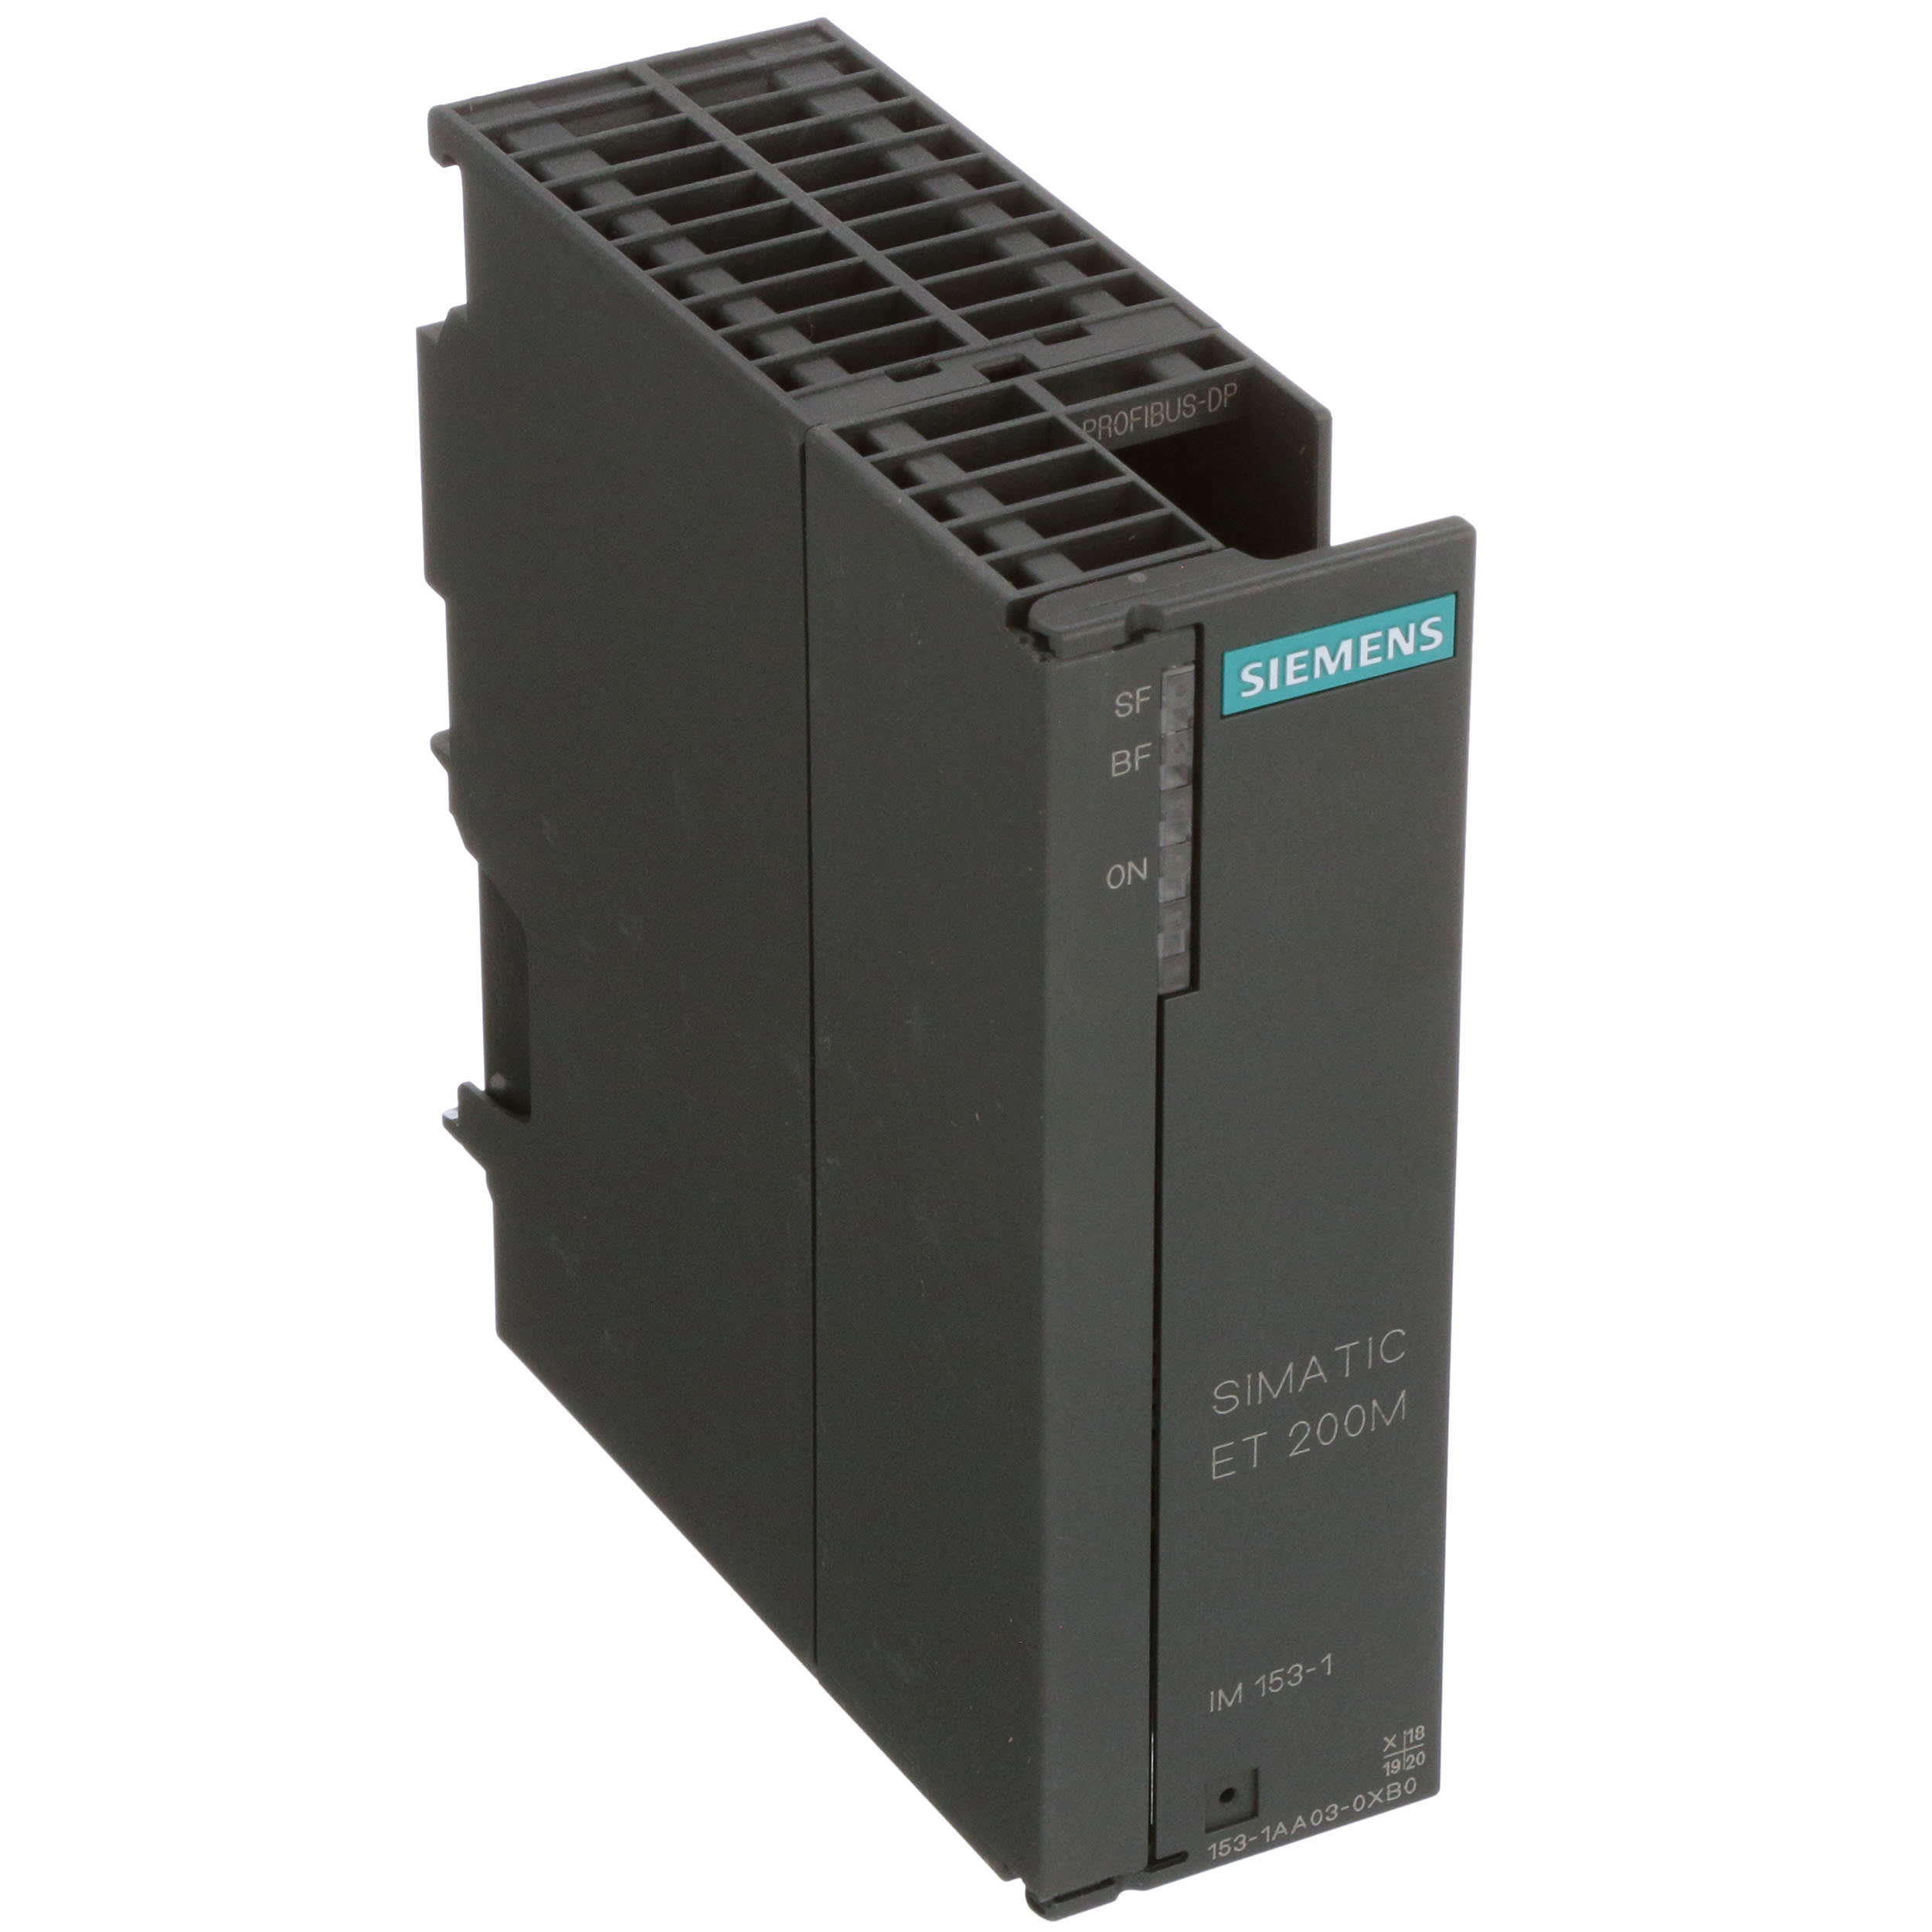 Siemens Simatic 6ES7153-1AA03-0XB0 6ES7 153-1AA03-0XB0  E:11